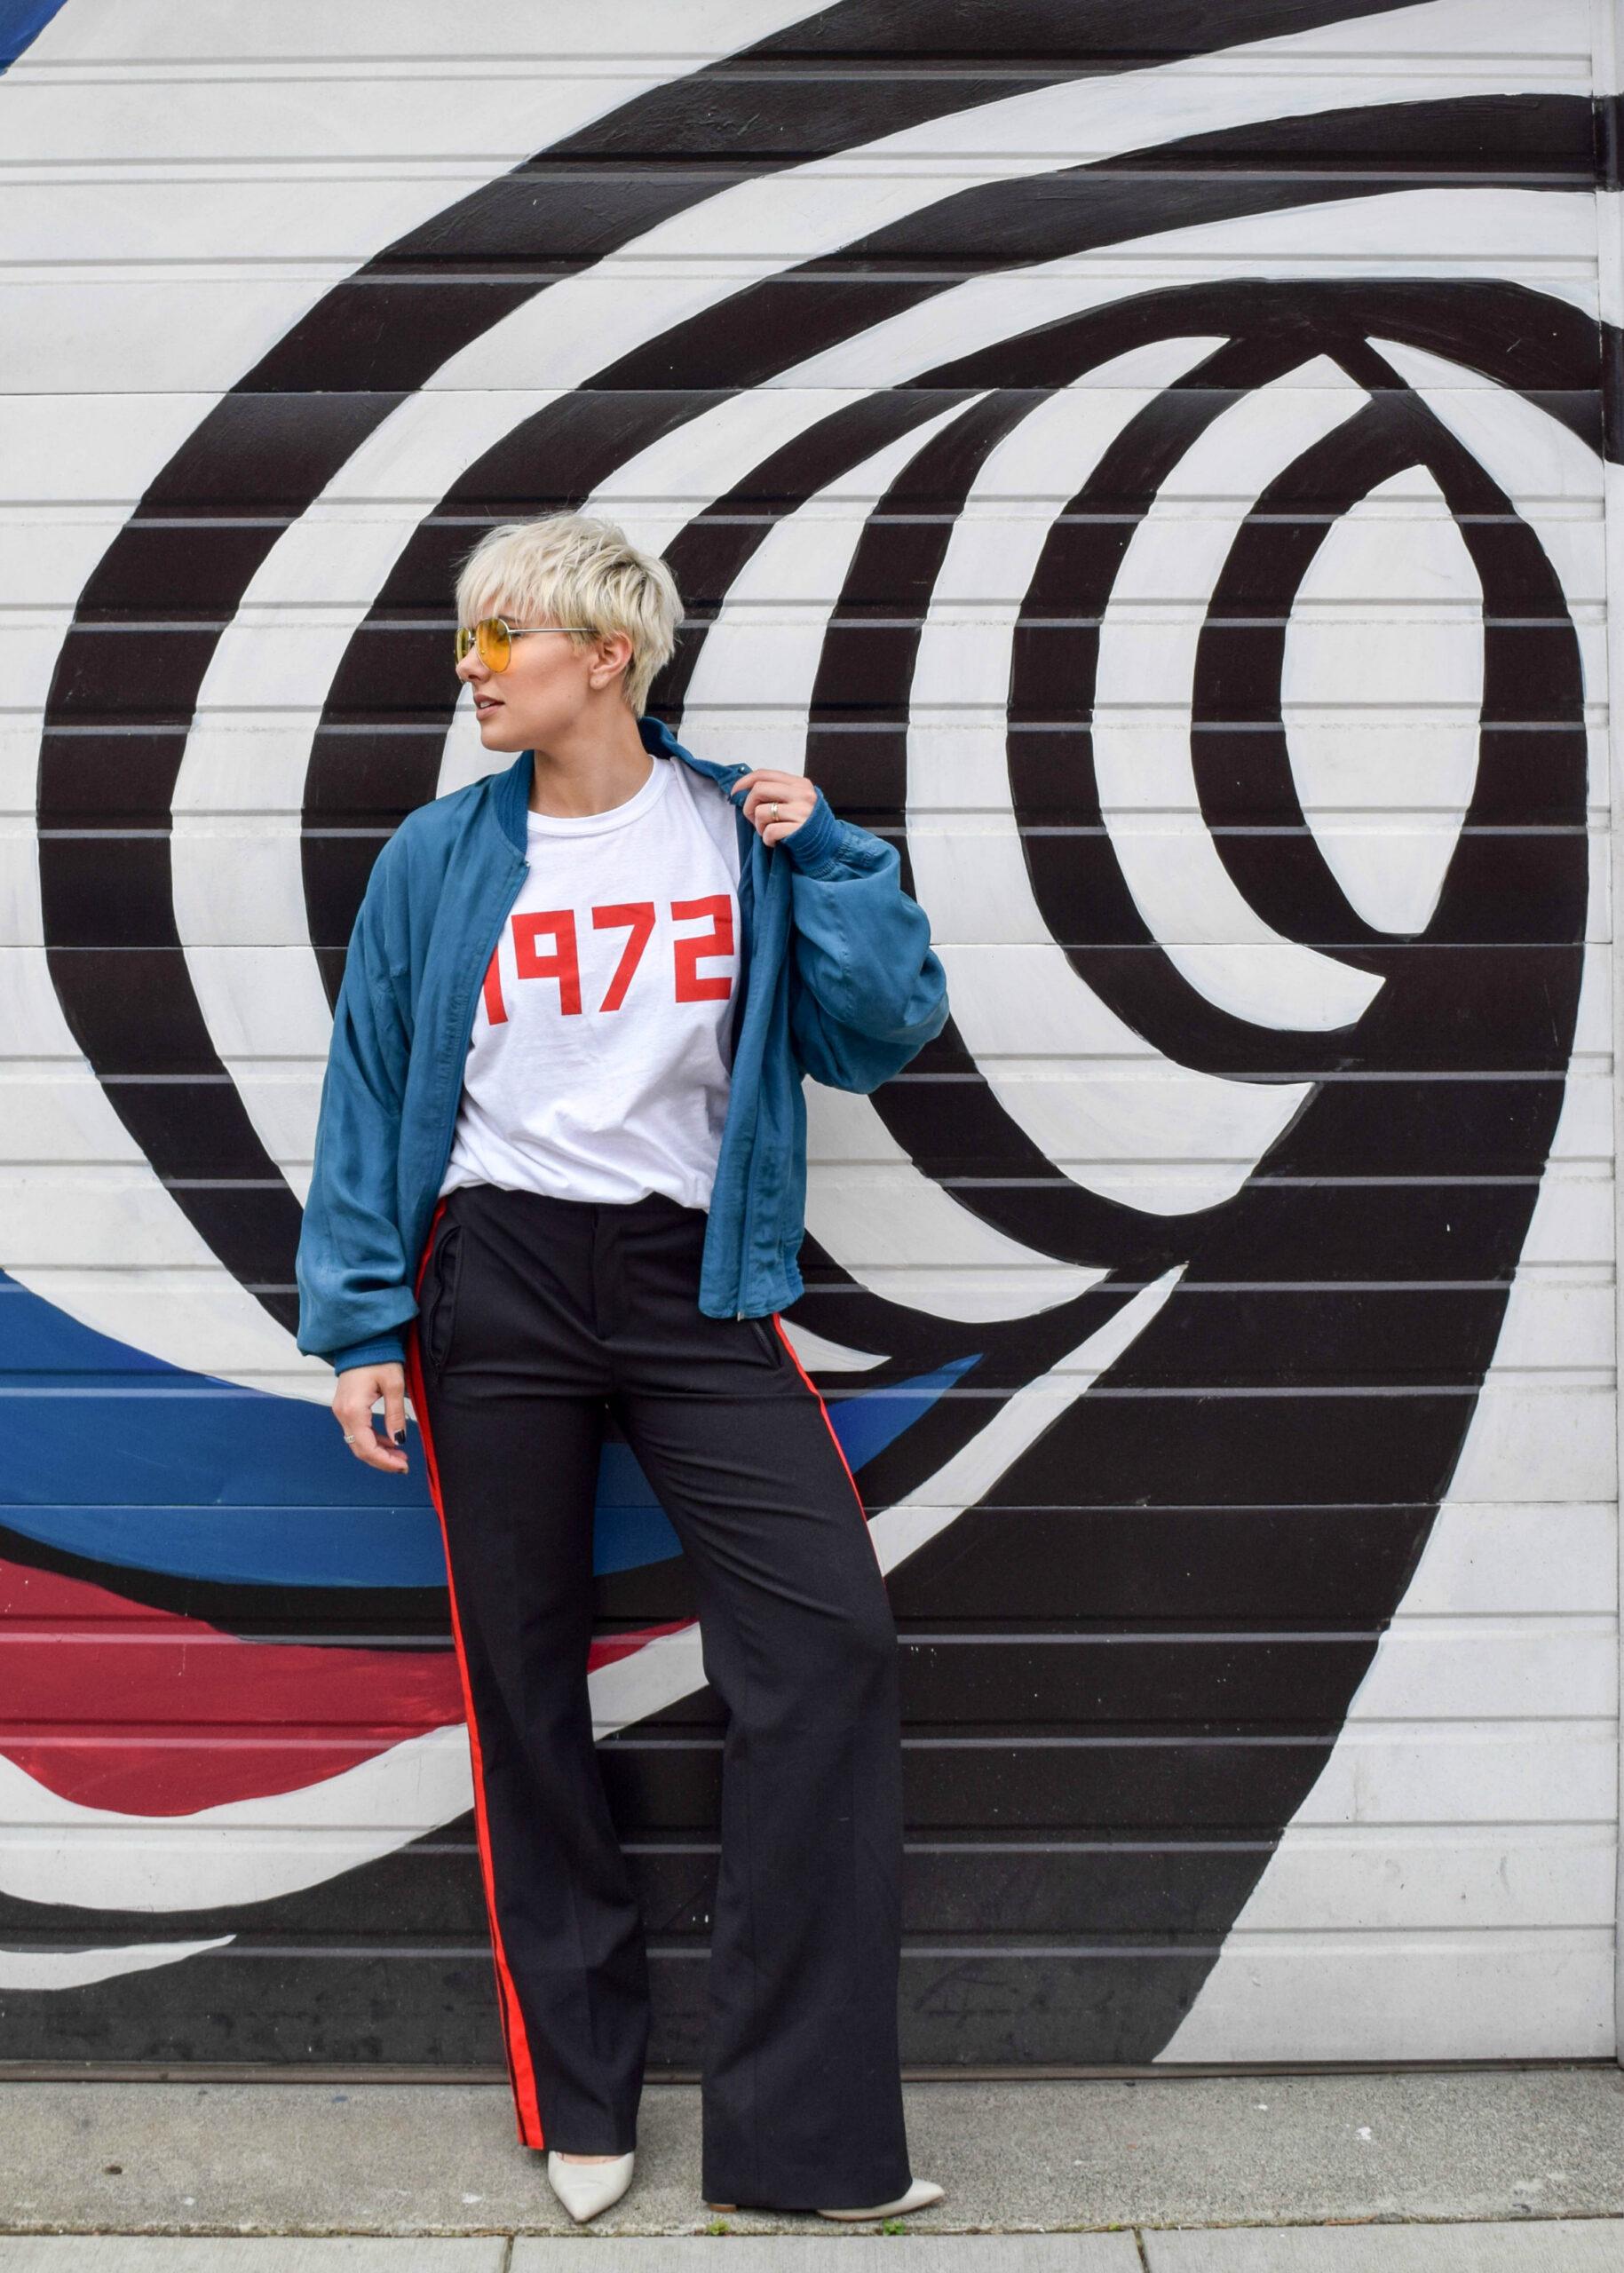 The Retro Look 3 - 3 New Ways to Wear Your Bomber Jacket for 2017 - BloggerNotBillionaire.com